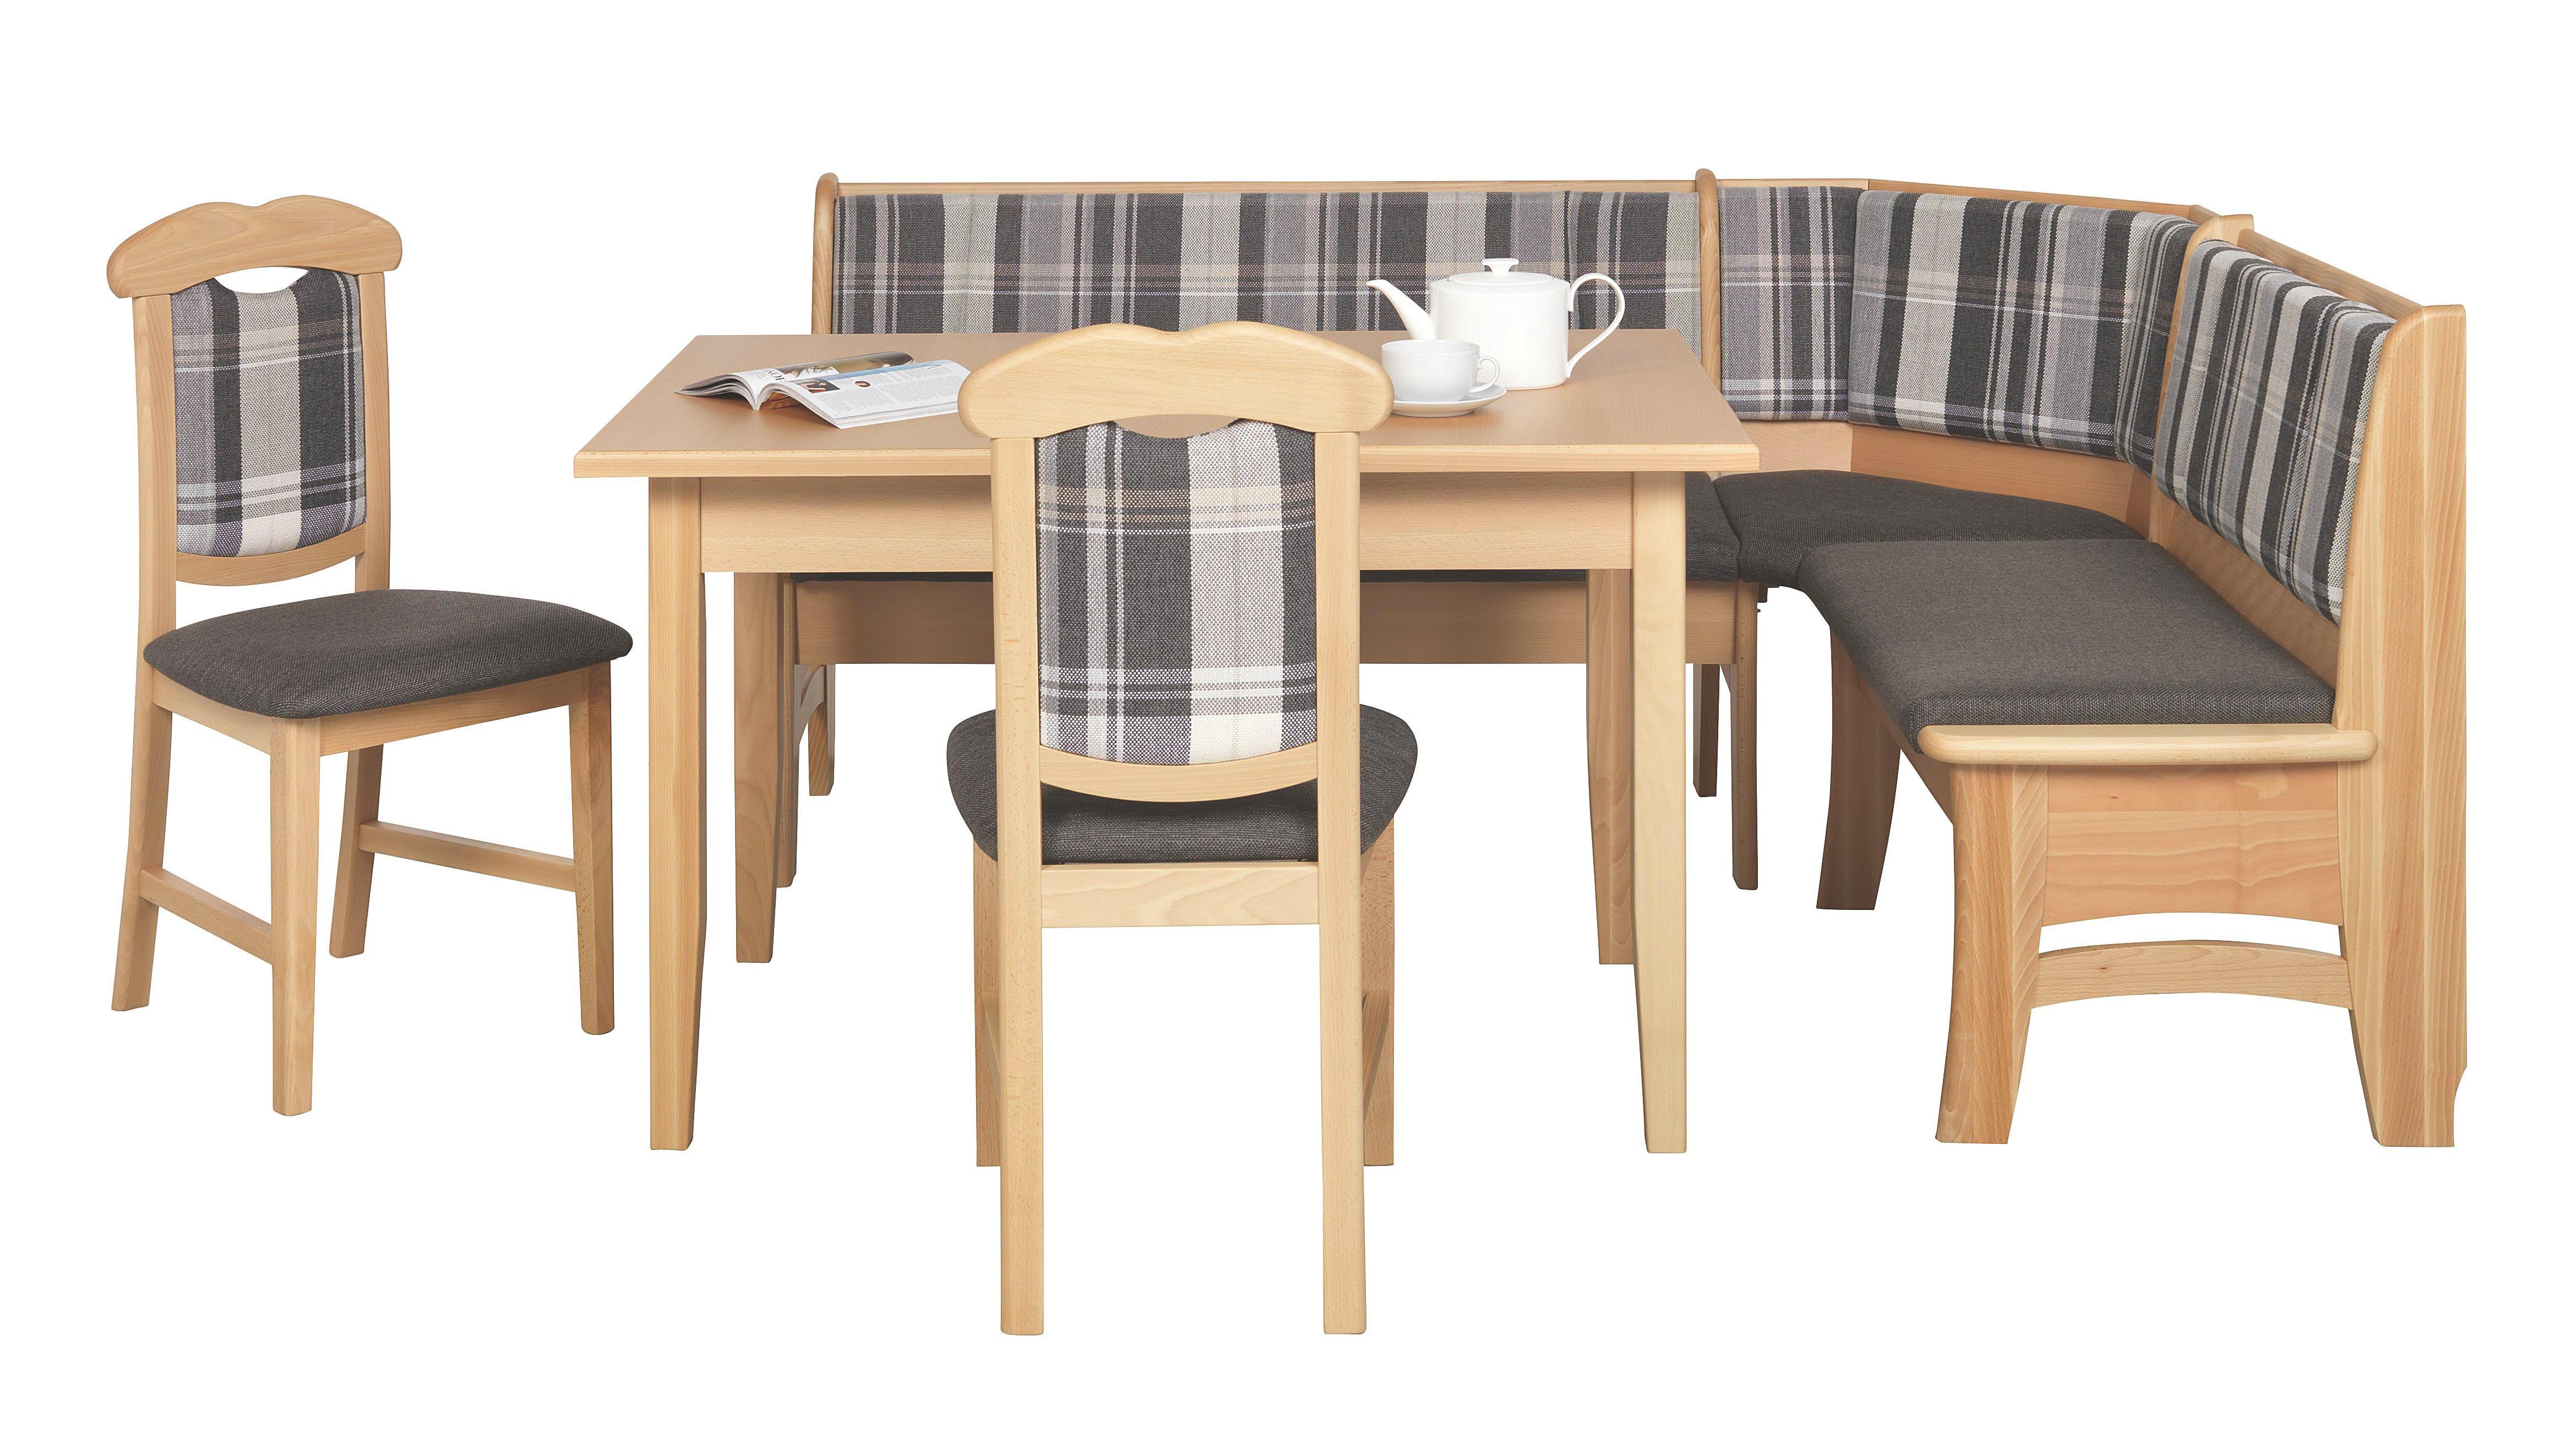 ECKBANKGRUPPE In Holz, Holzwerkstoff, Textil Braun, Buchefarben, Grau,  Hellblau   Buchefarben